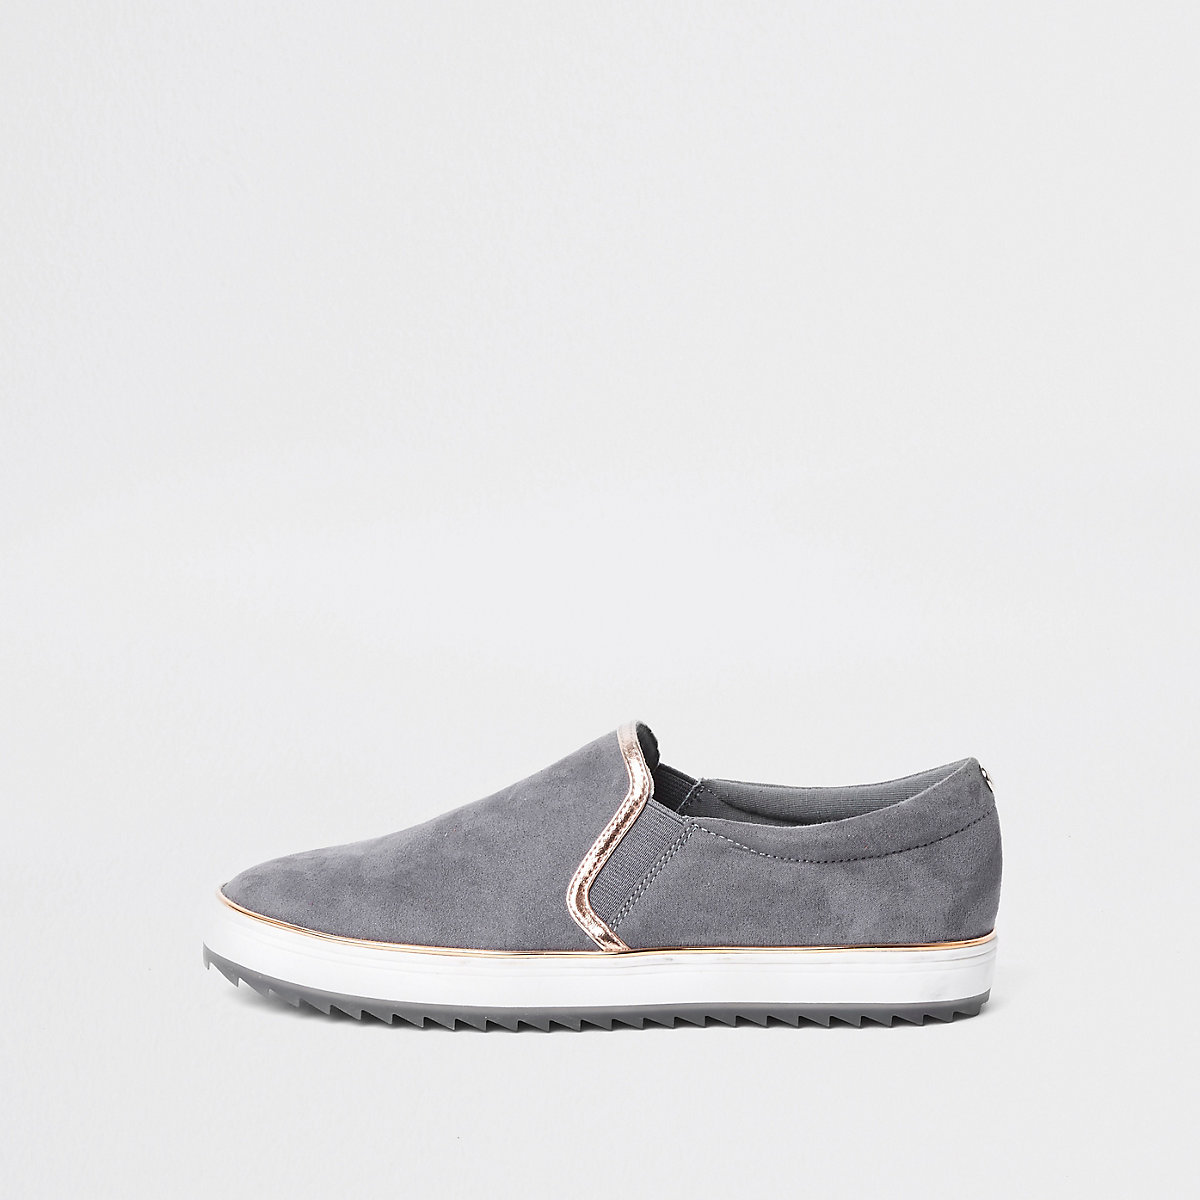 Grey slip on plimsolls